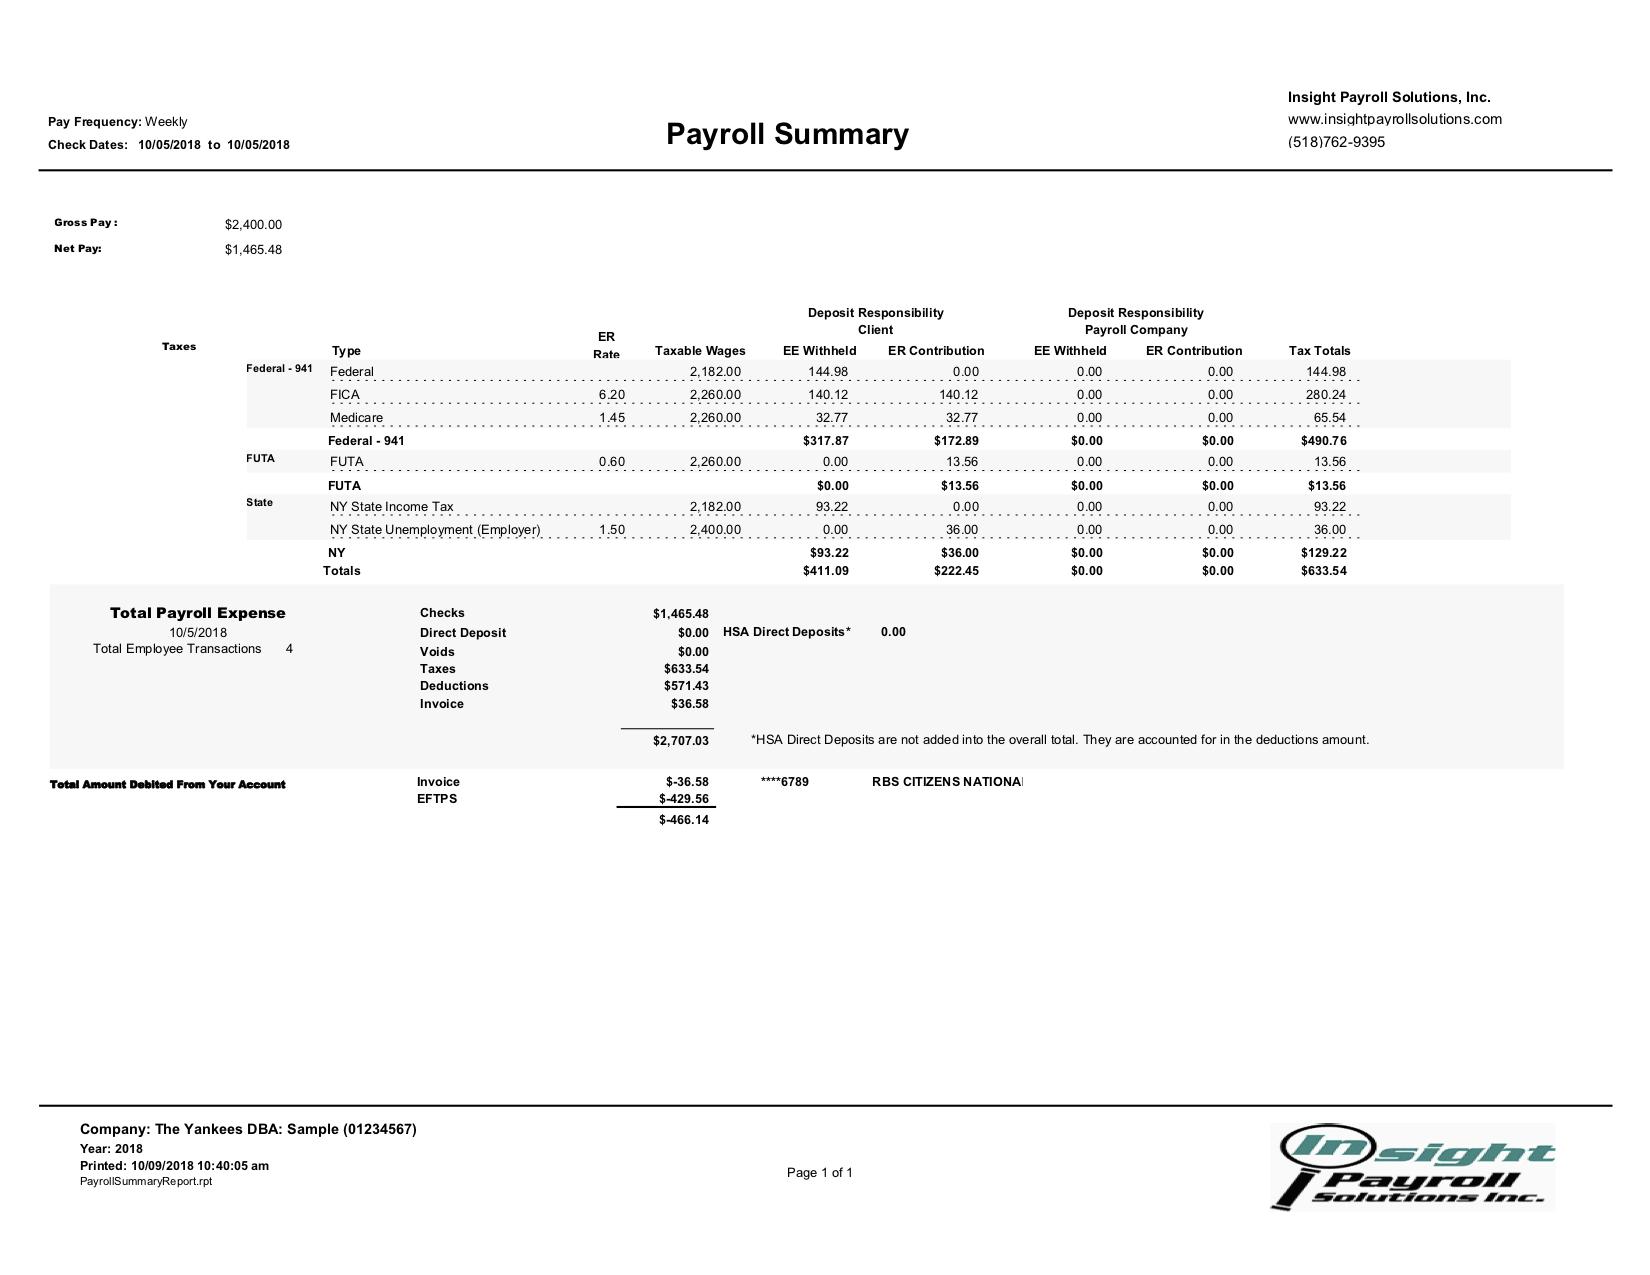 Payroll - Insight Payroll Solutions